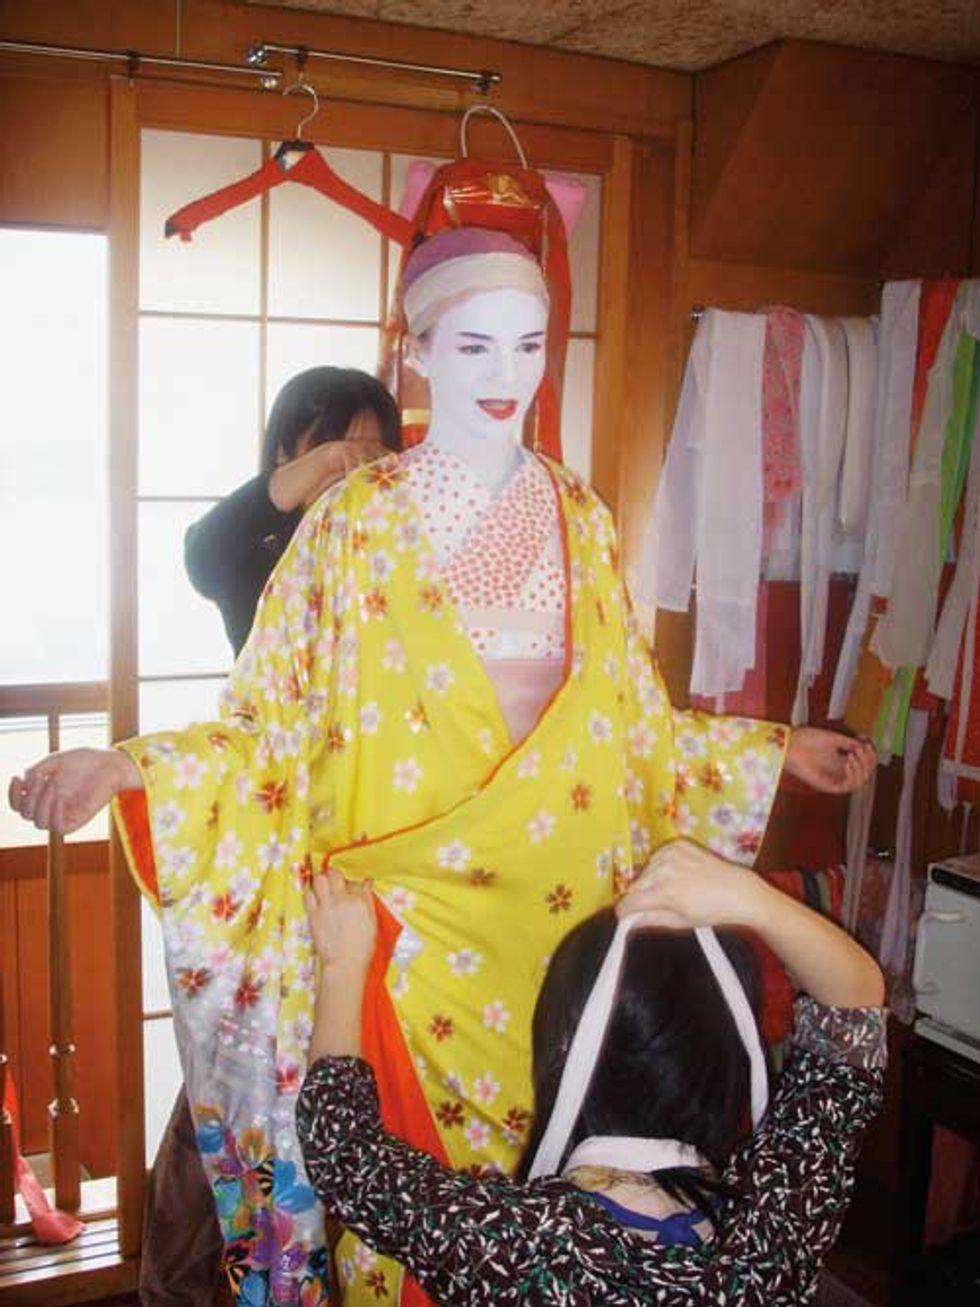 Amber Tamblyn: Geishas Gone Wild